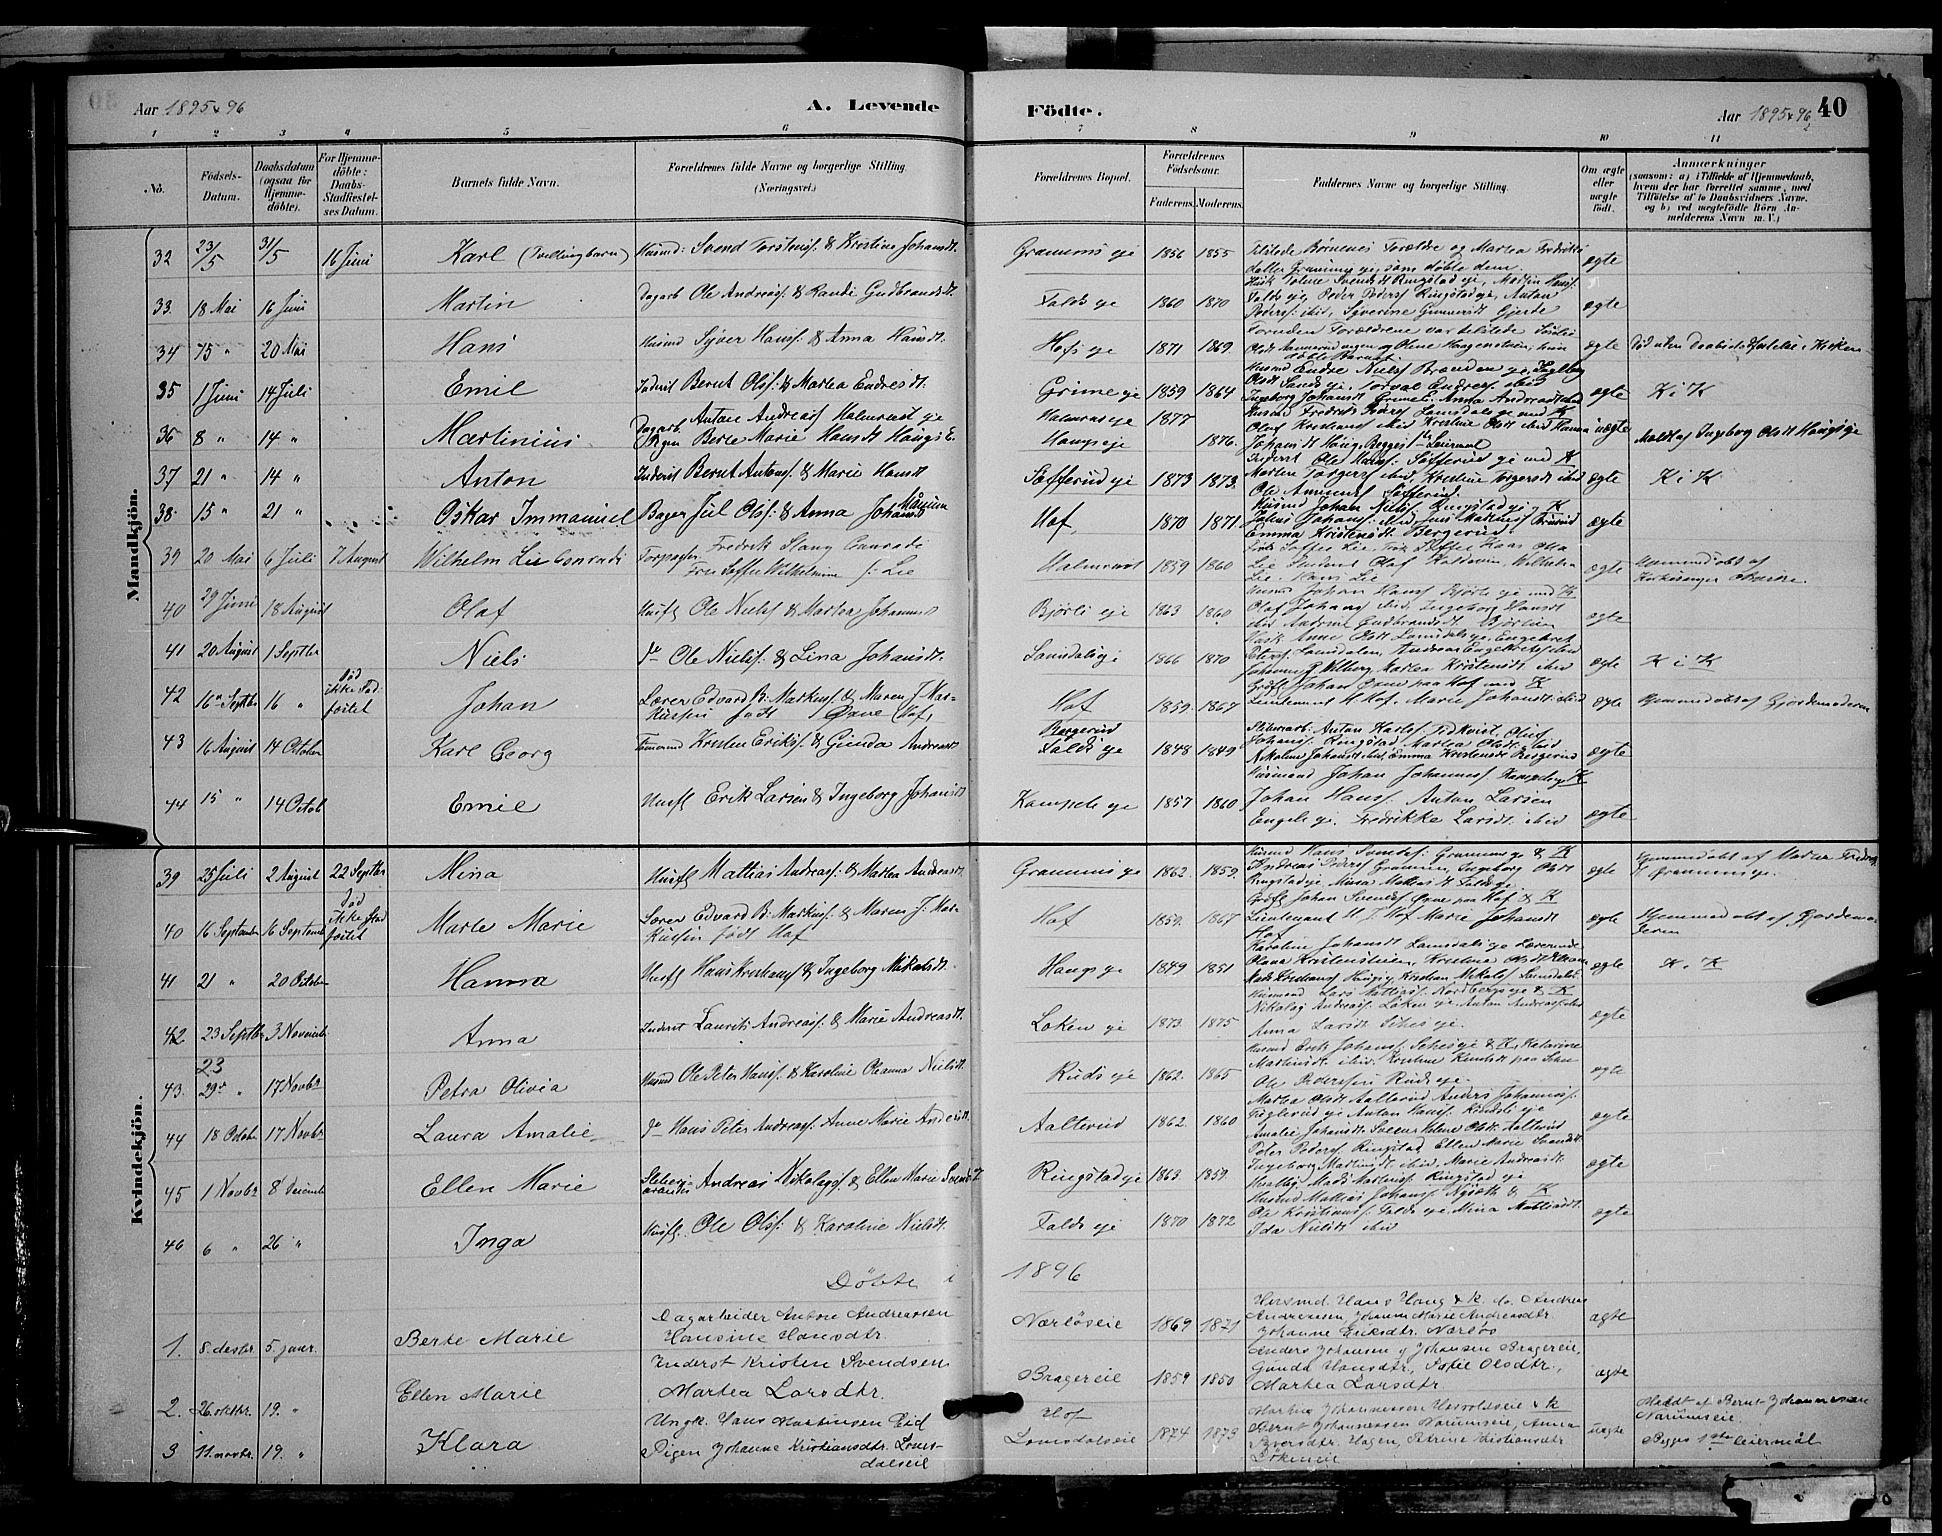 SAH, Søndre Land prestekontor, L/L0002: Klokkerbok nr. 2, 1884-1900, s. 40